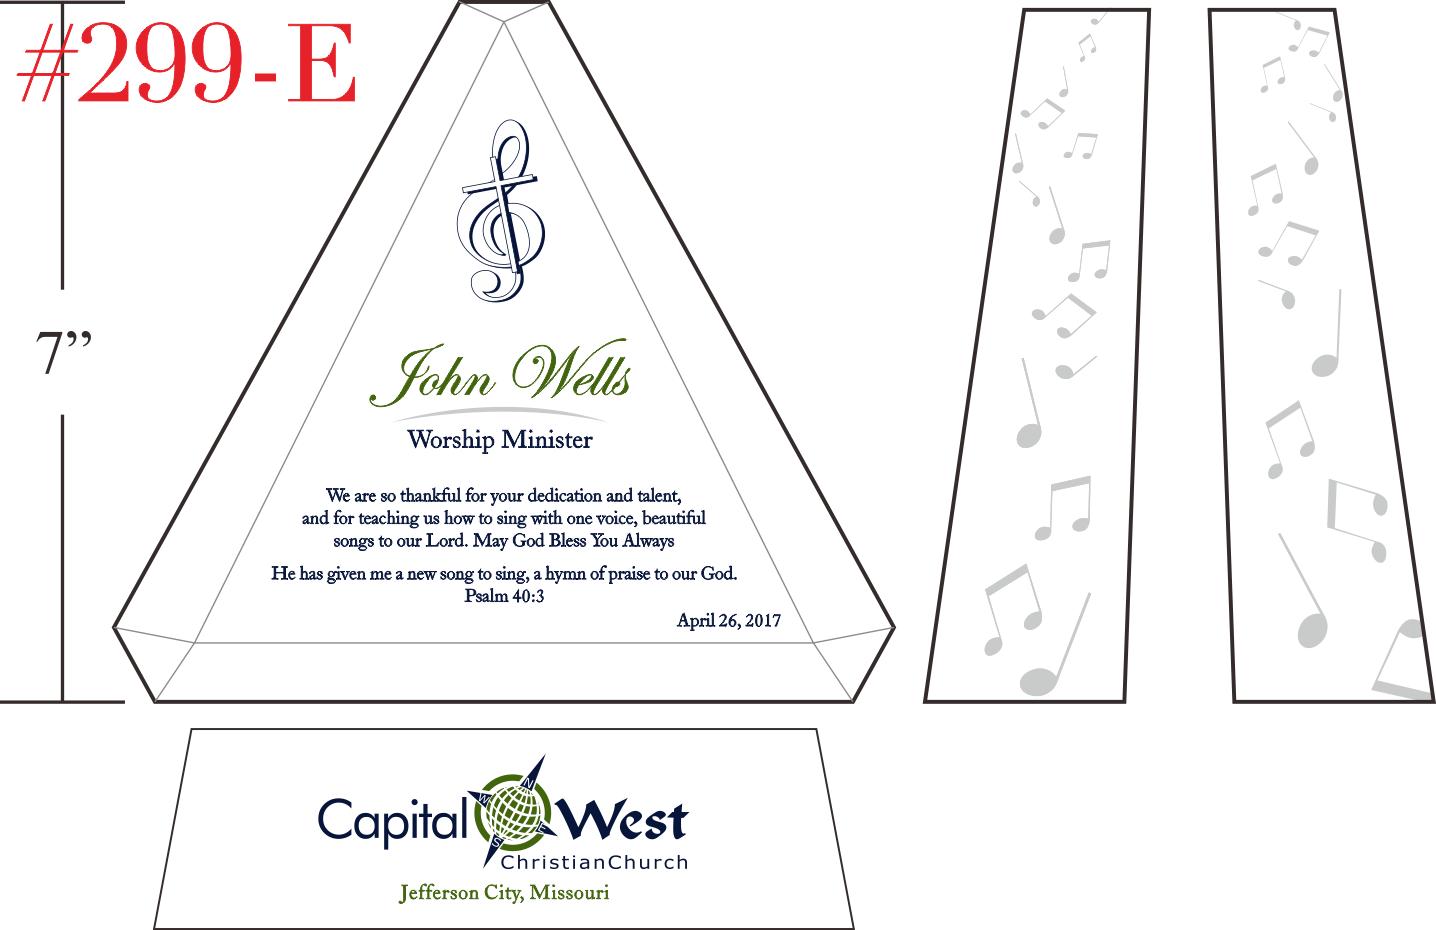 Worship Leader/Minister Appreciation Gift